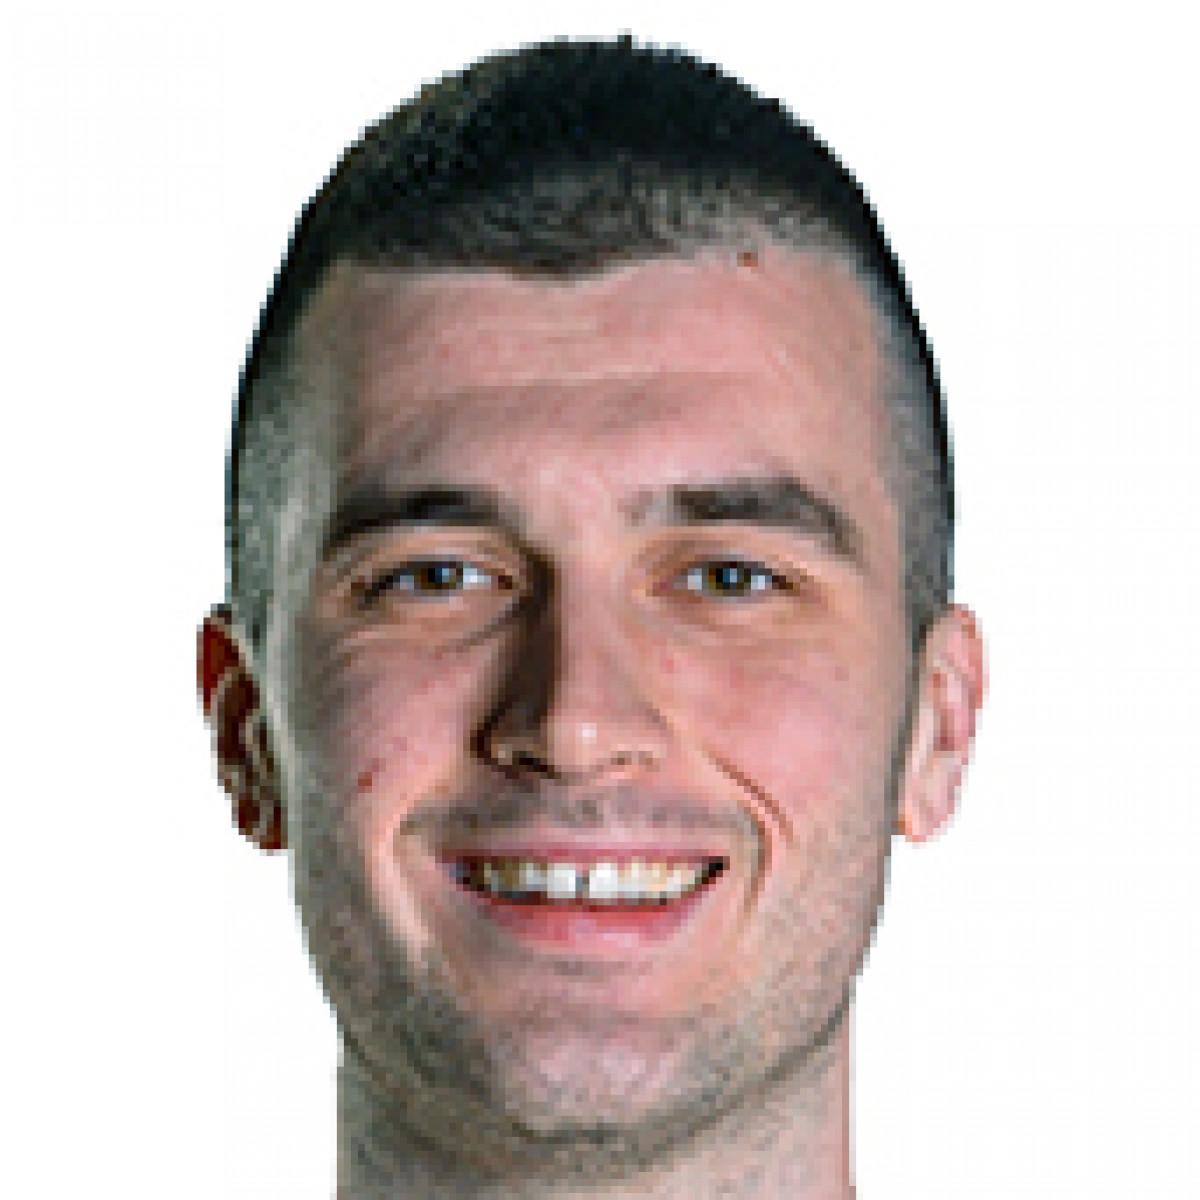 Marko Pajic